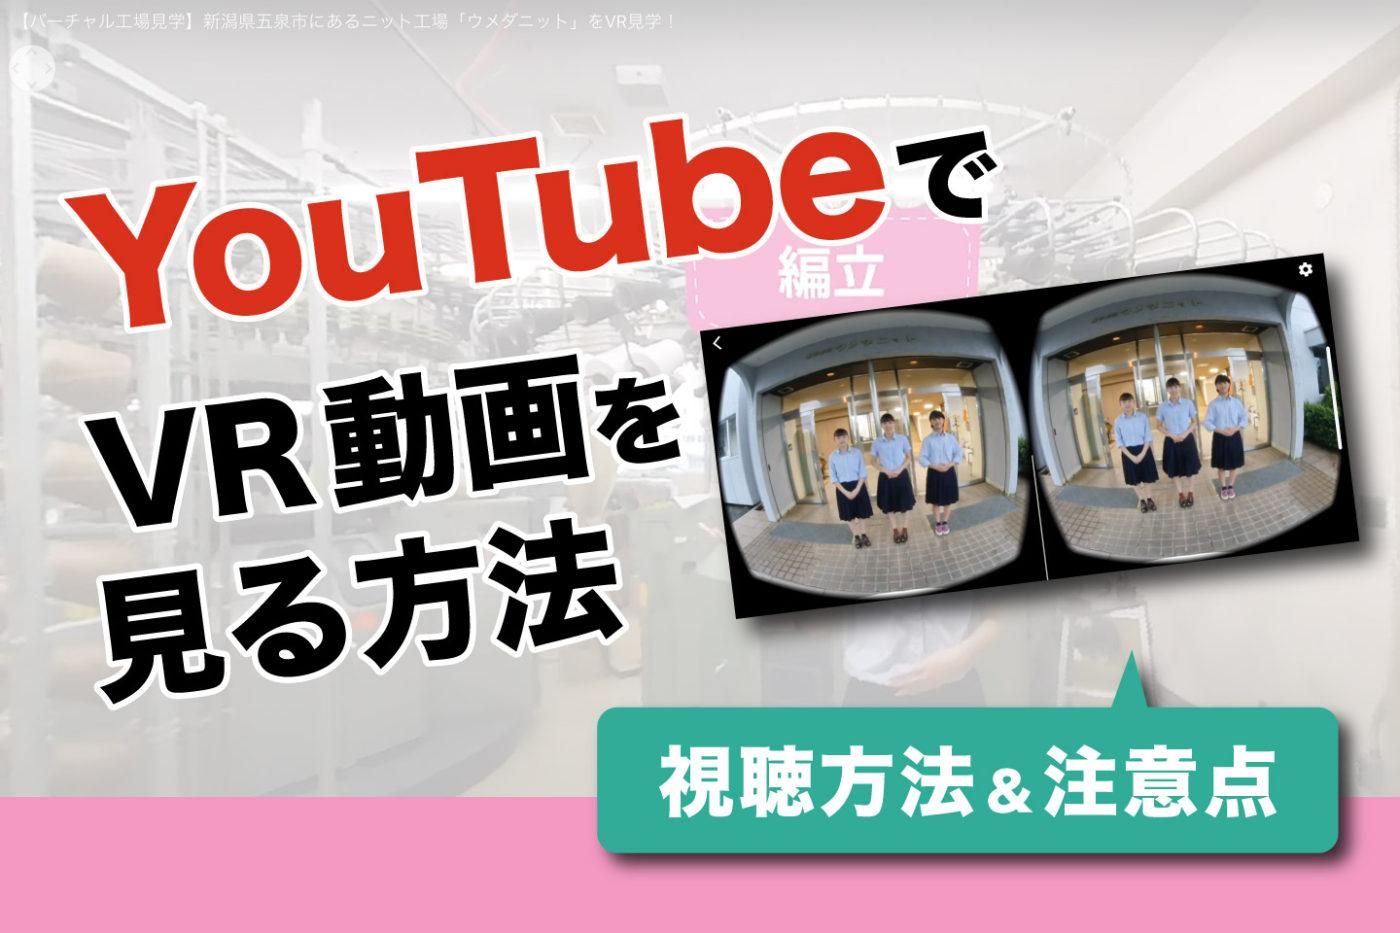 YouTubeでVR動画を見る方法【視聴方法&注意点】